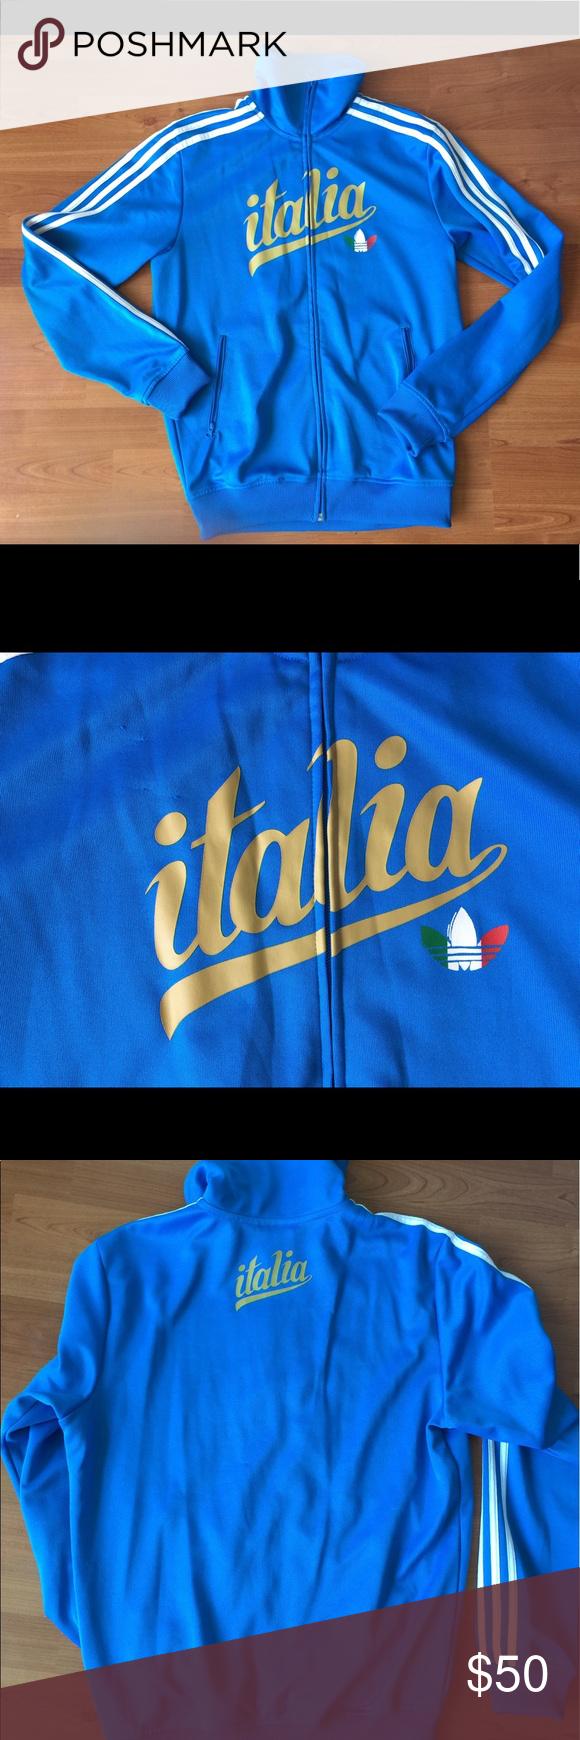 Adidas Italia Italy Blue Track Jacket Adidas Italia Track Jacket Mens